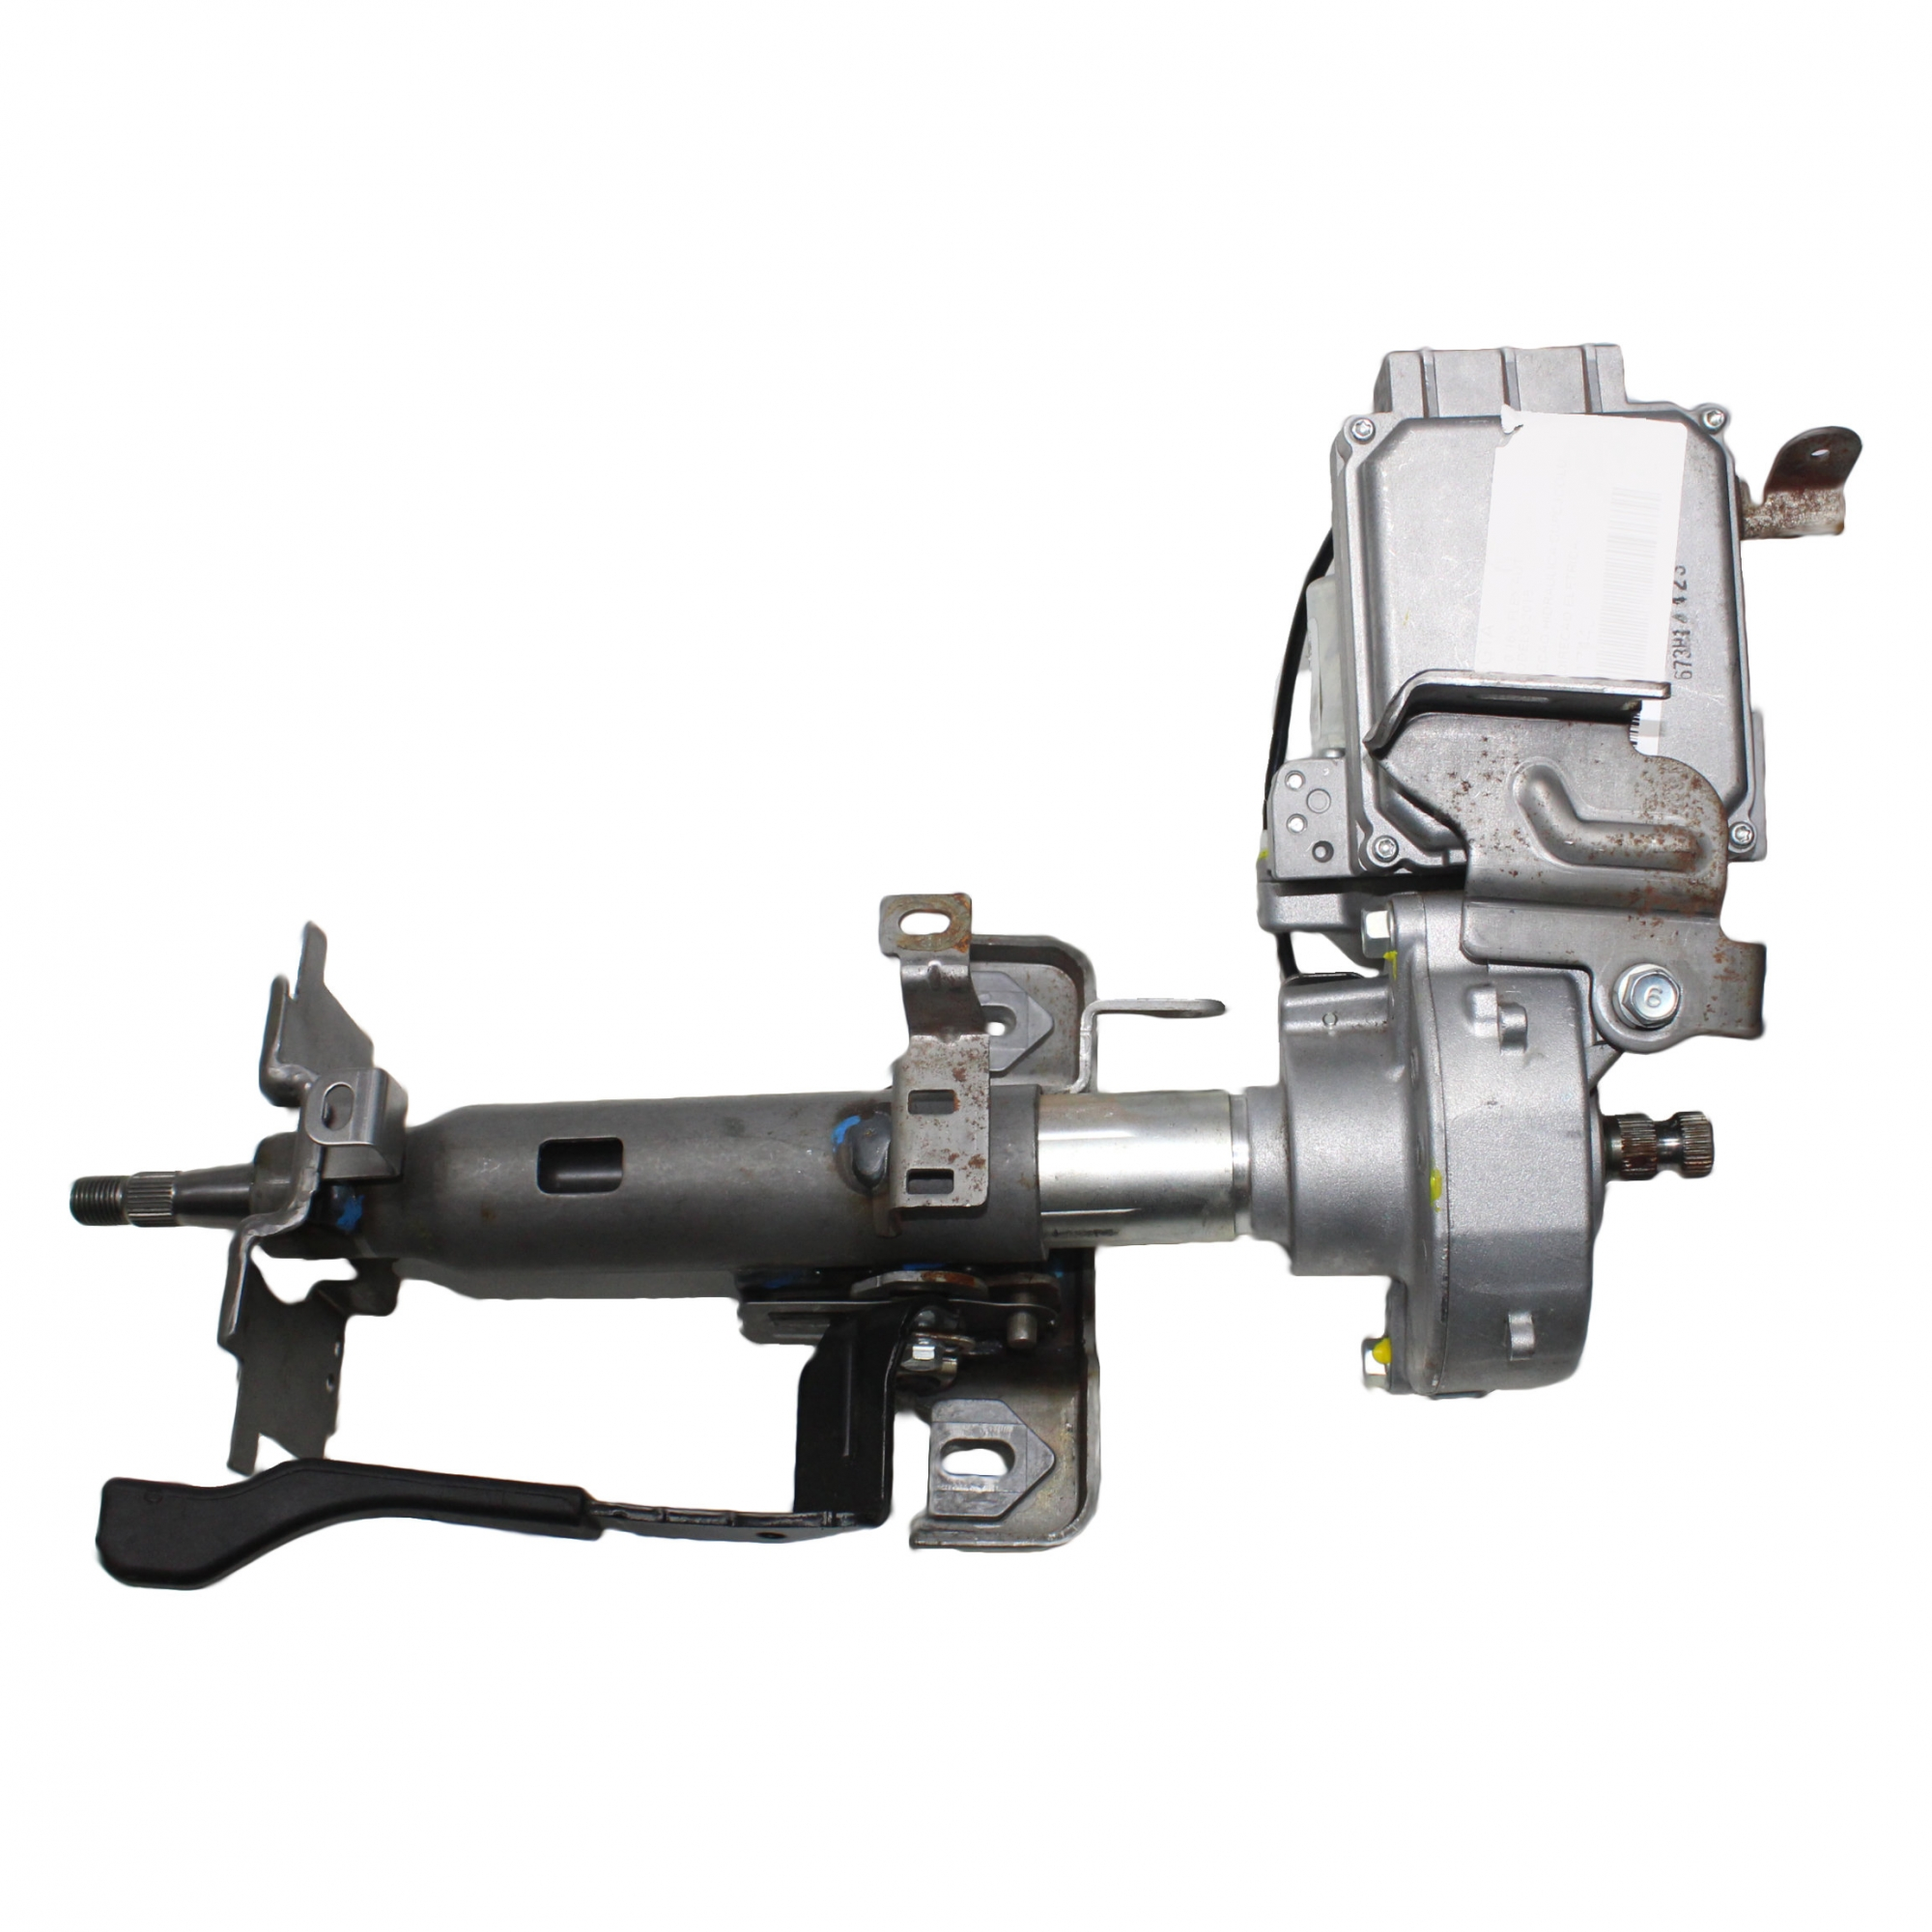 Motor Coluna Direção Elétrica JTEKT Nissan Sentra 2014...2019